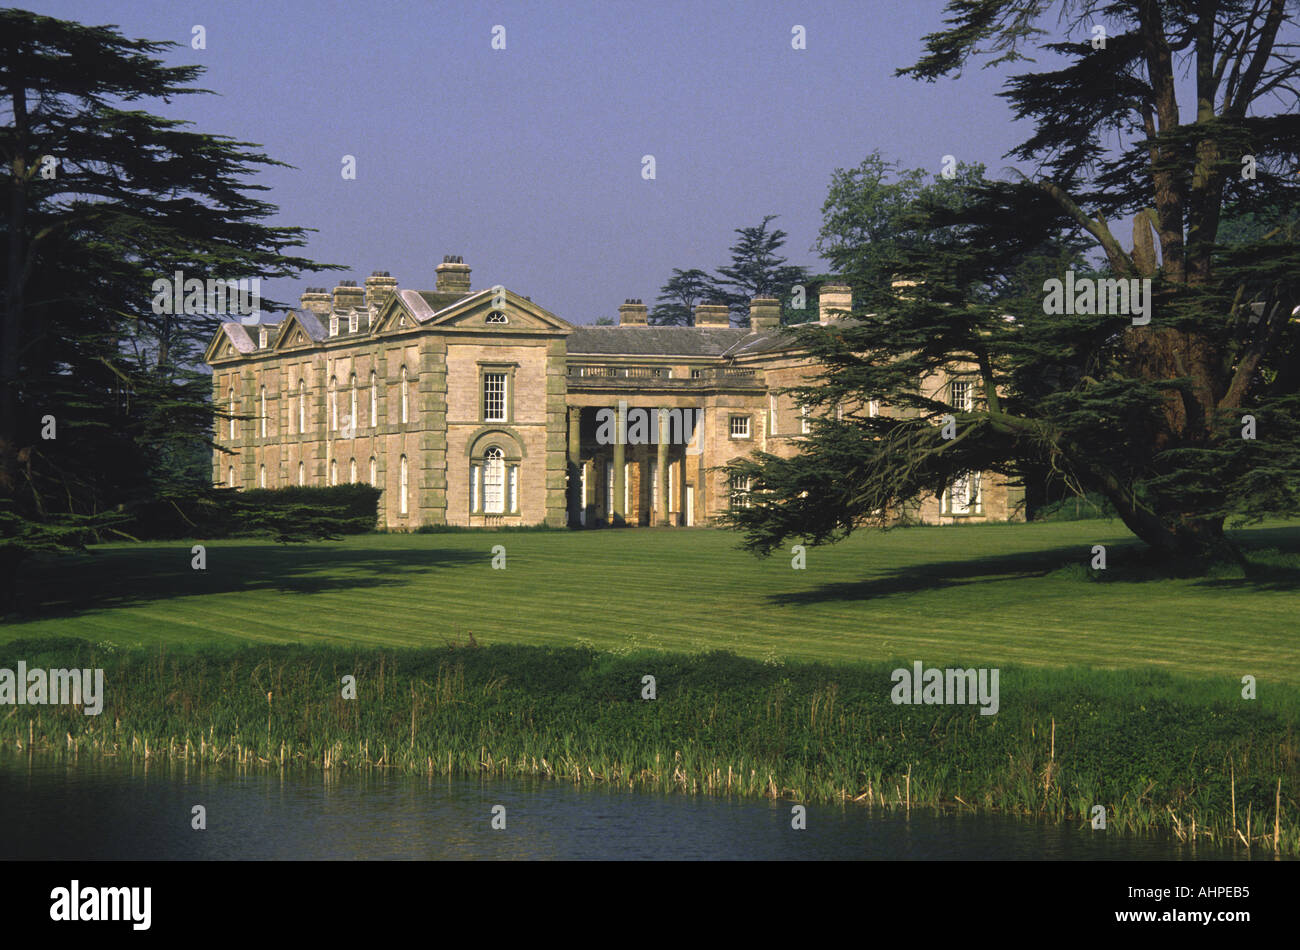 Compton Verney House, Warwickshire, England, UK. - Stock Image